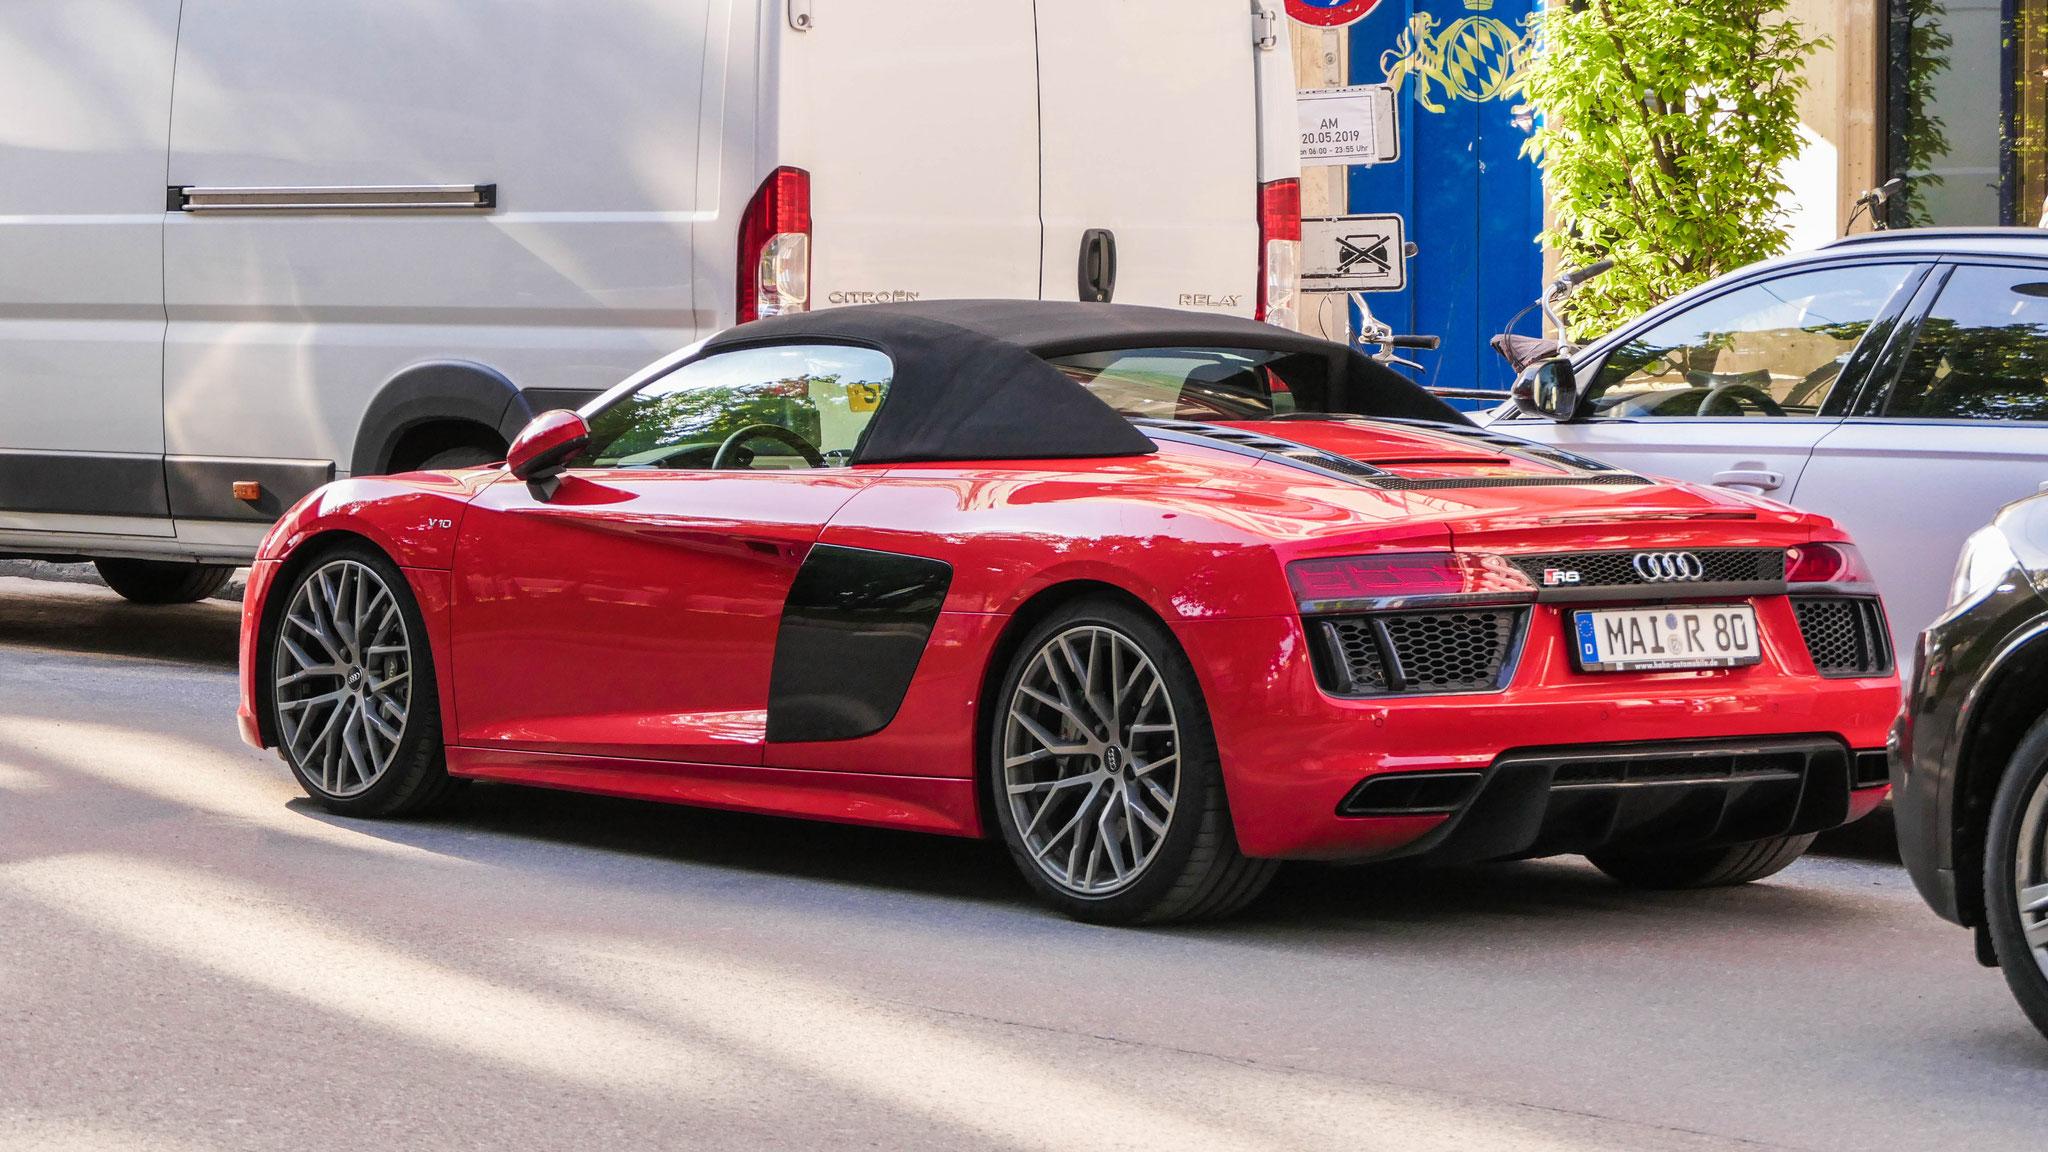 Audi R8 V10 Spyder - MAI-R-80